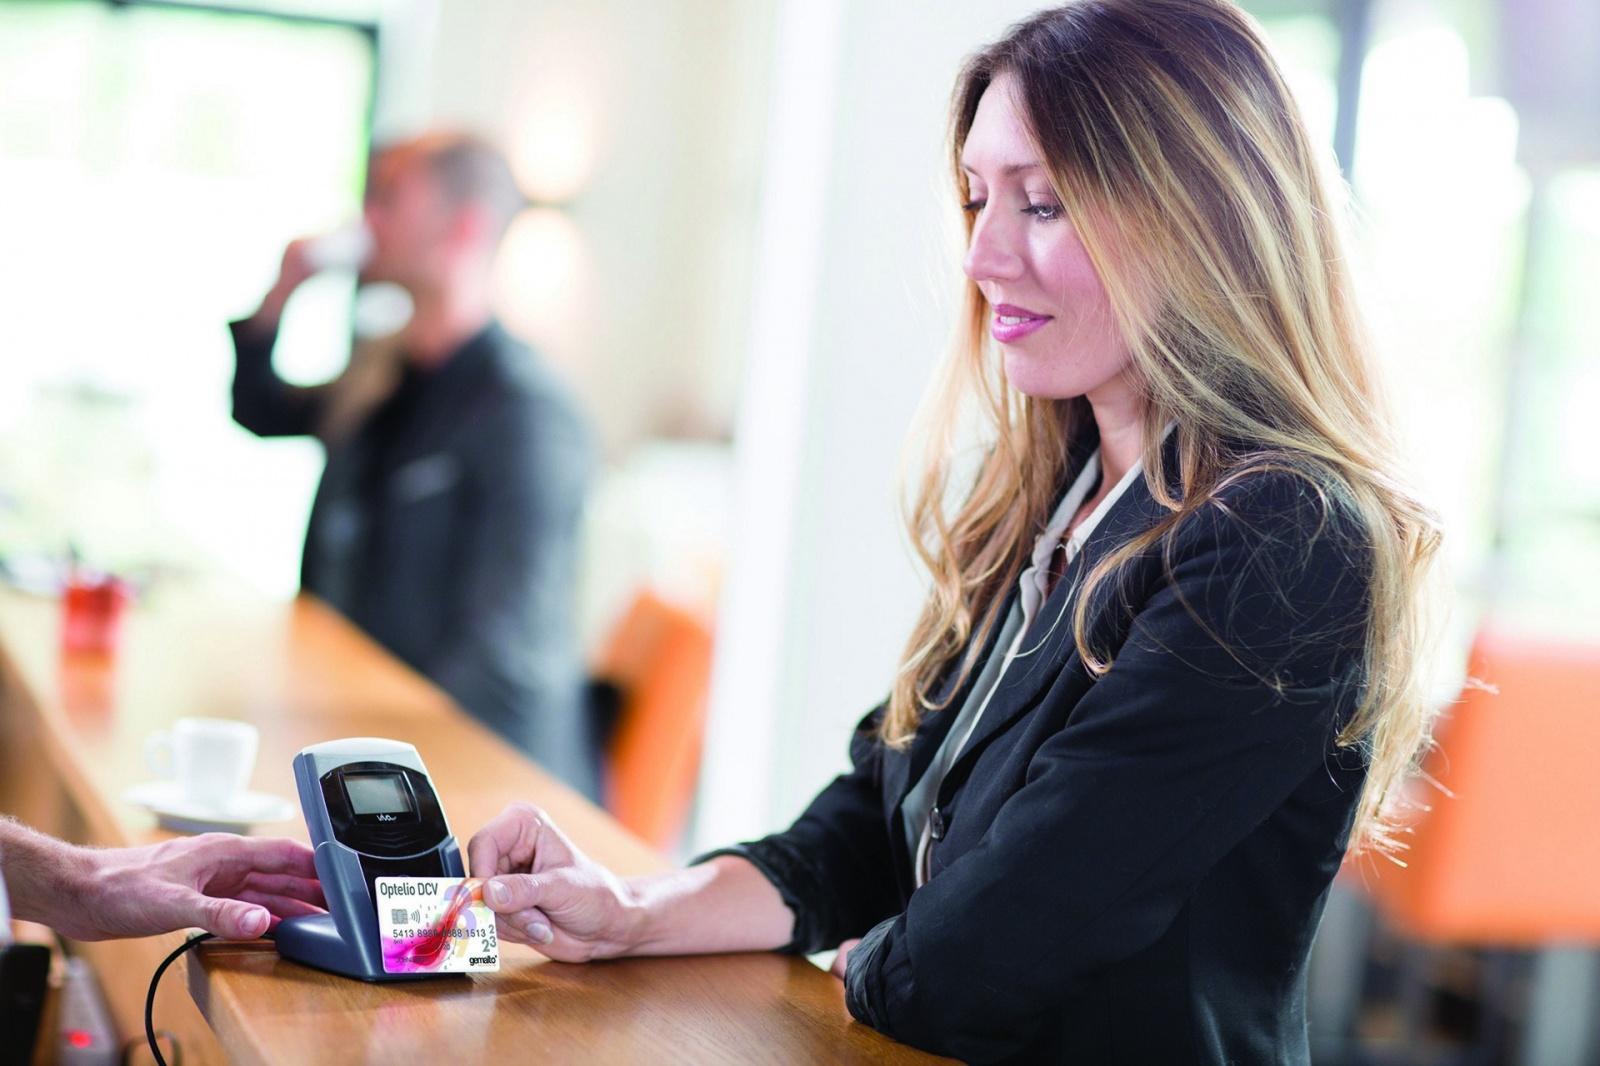 Как обезопасить процесс онлайн-покупок - 4